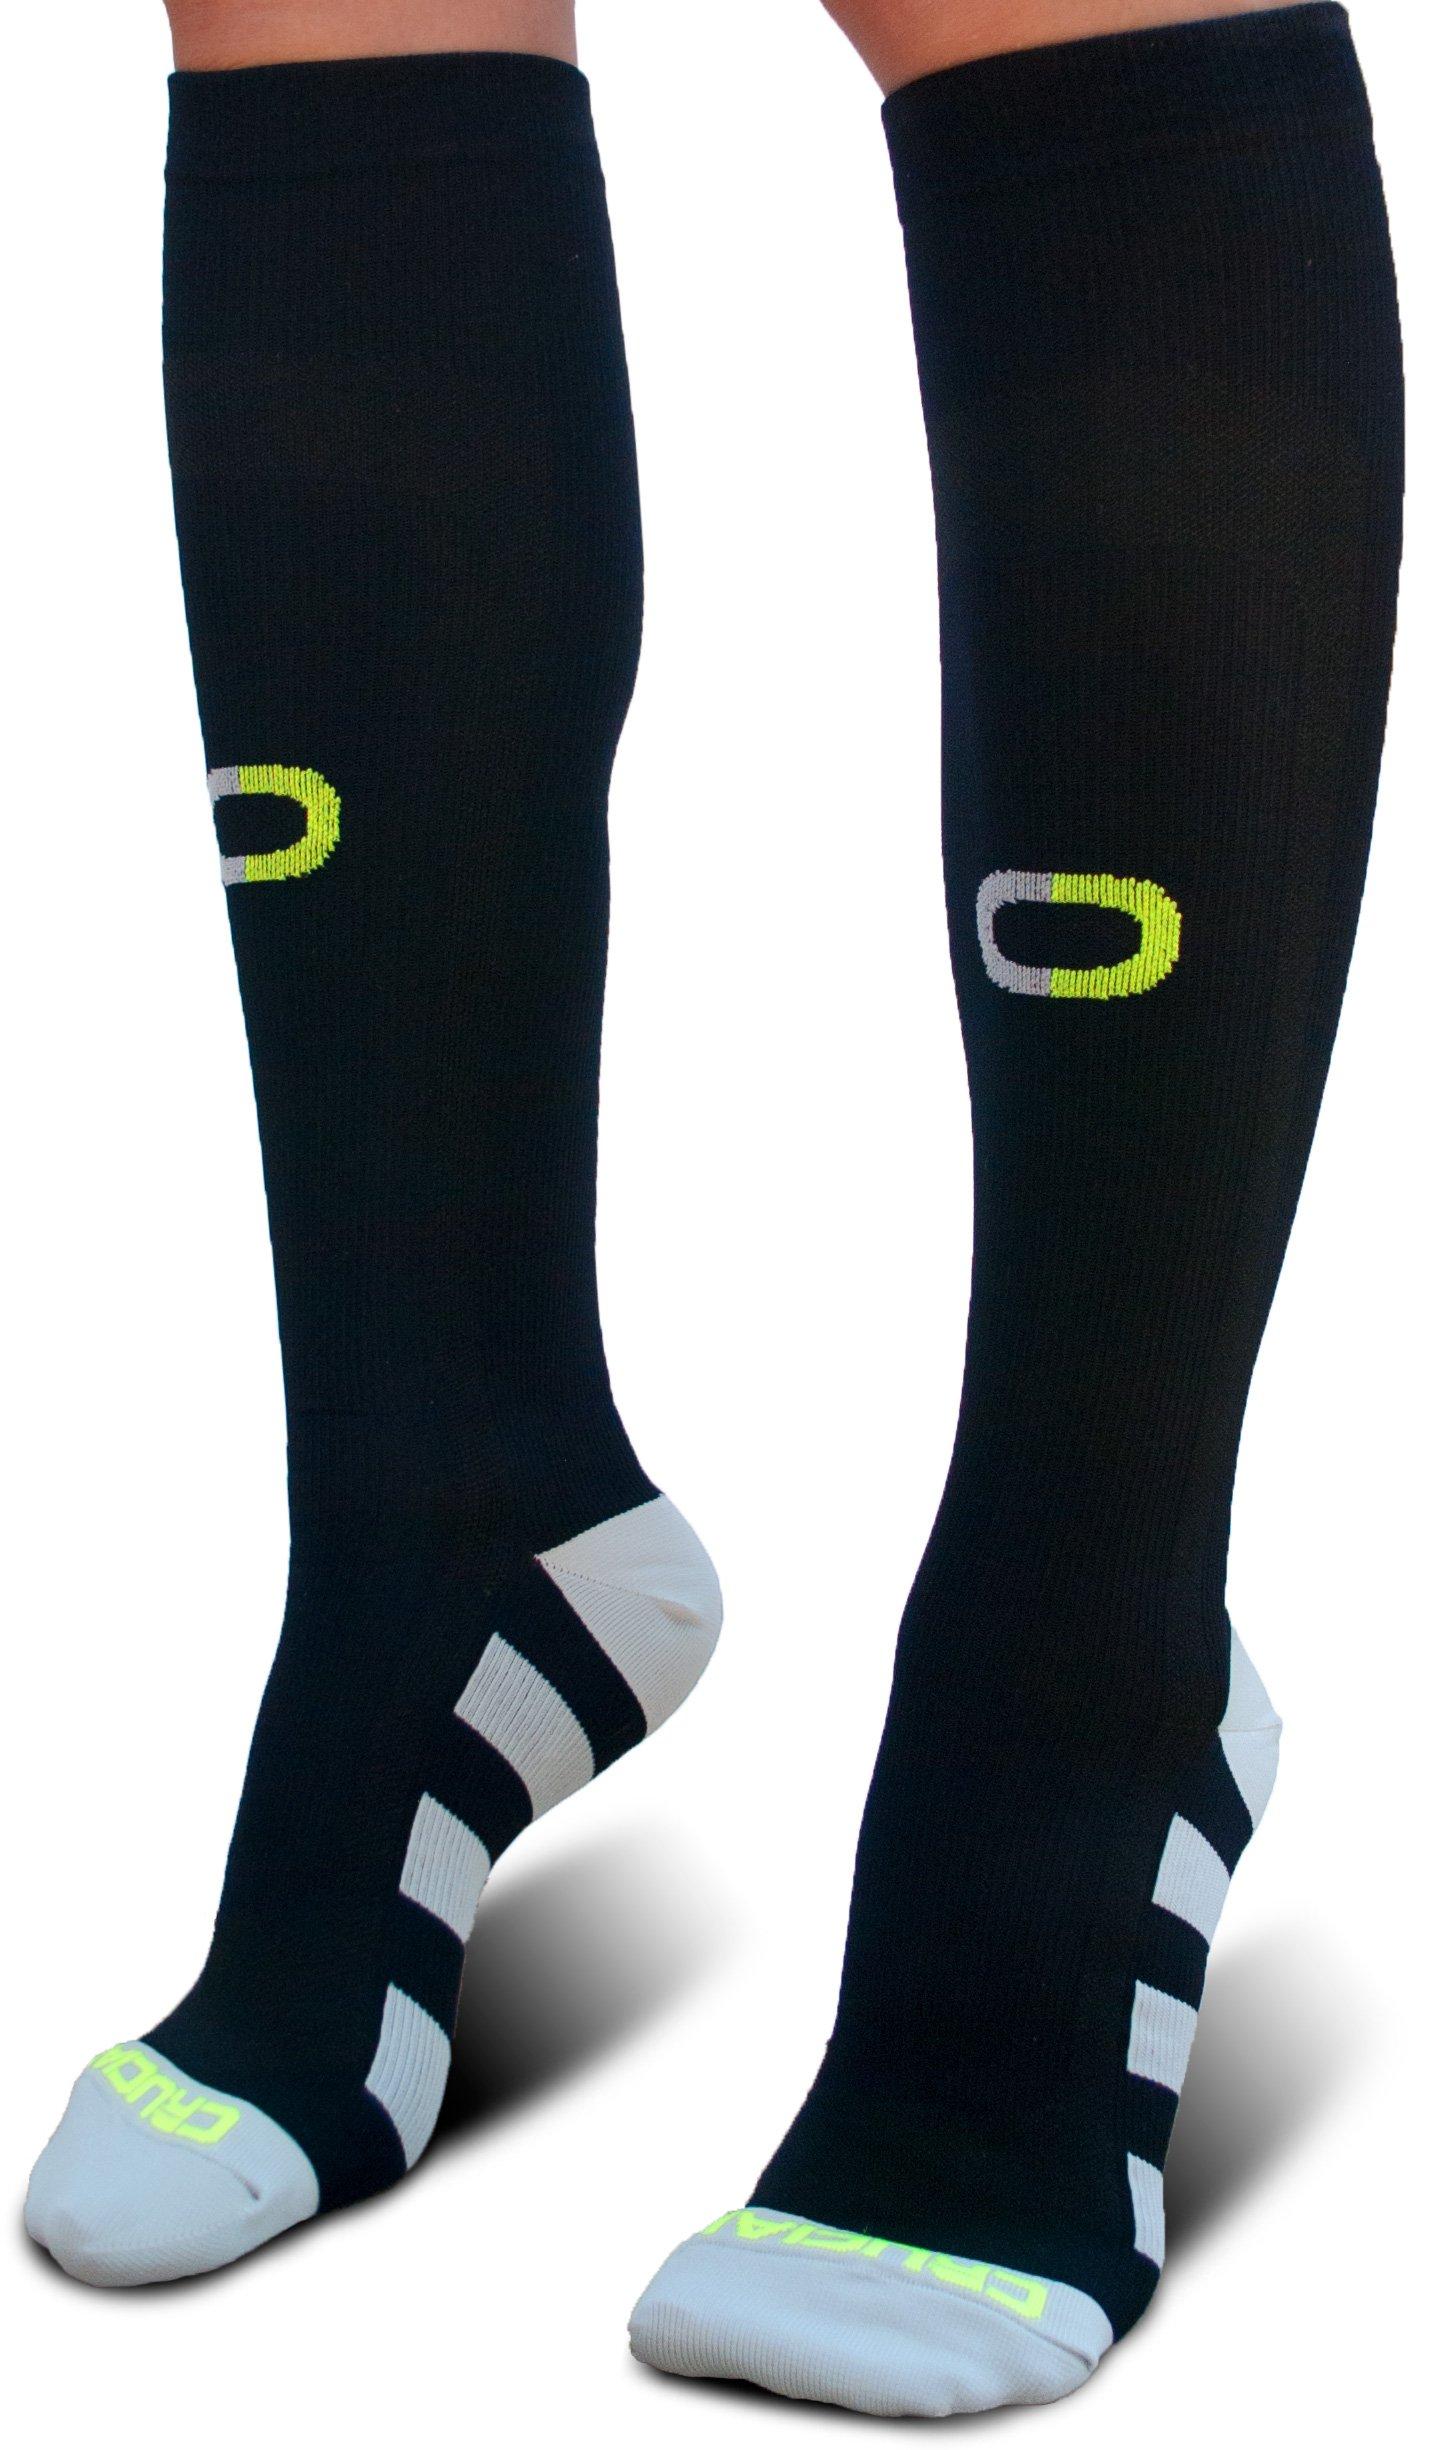 93cfe40a0d Pro Compression Socks for Men & Women (20-30mmHg) - Best Graduated Stockings  for Running, Athletic, Stamina, Travel, Flight, Pregnancy, Maternity,  Nursing, ...